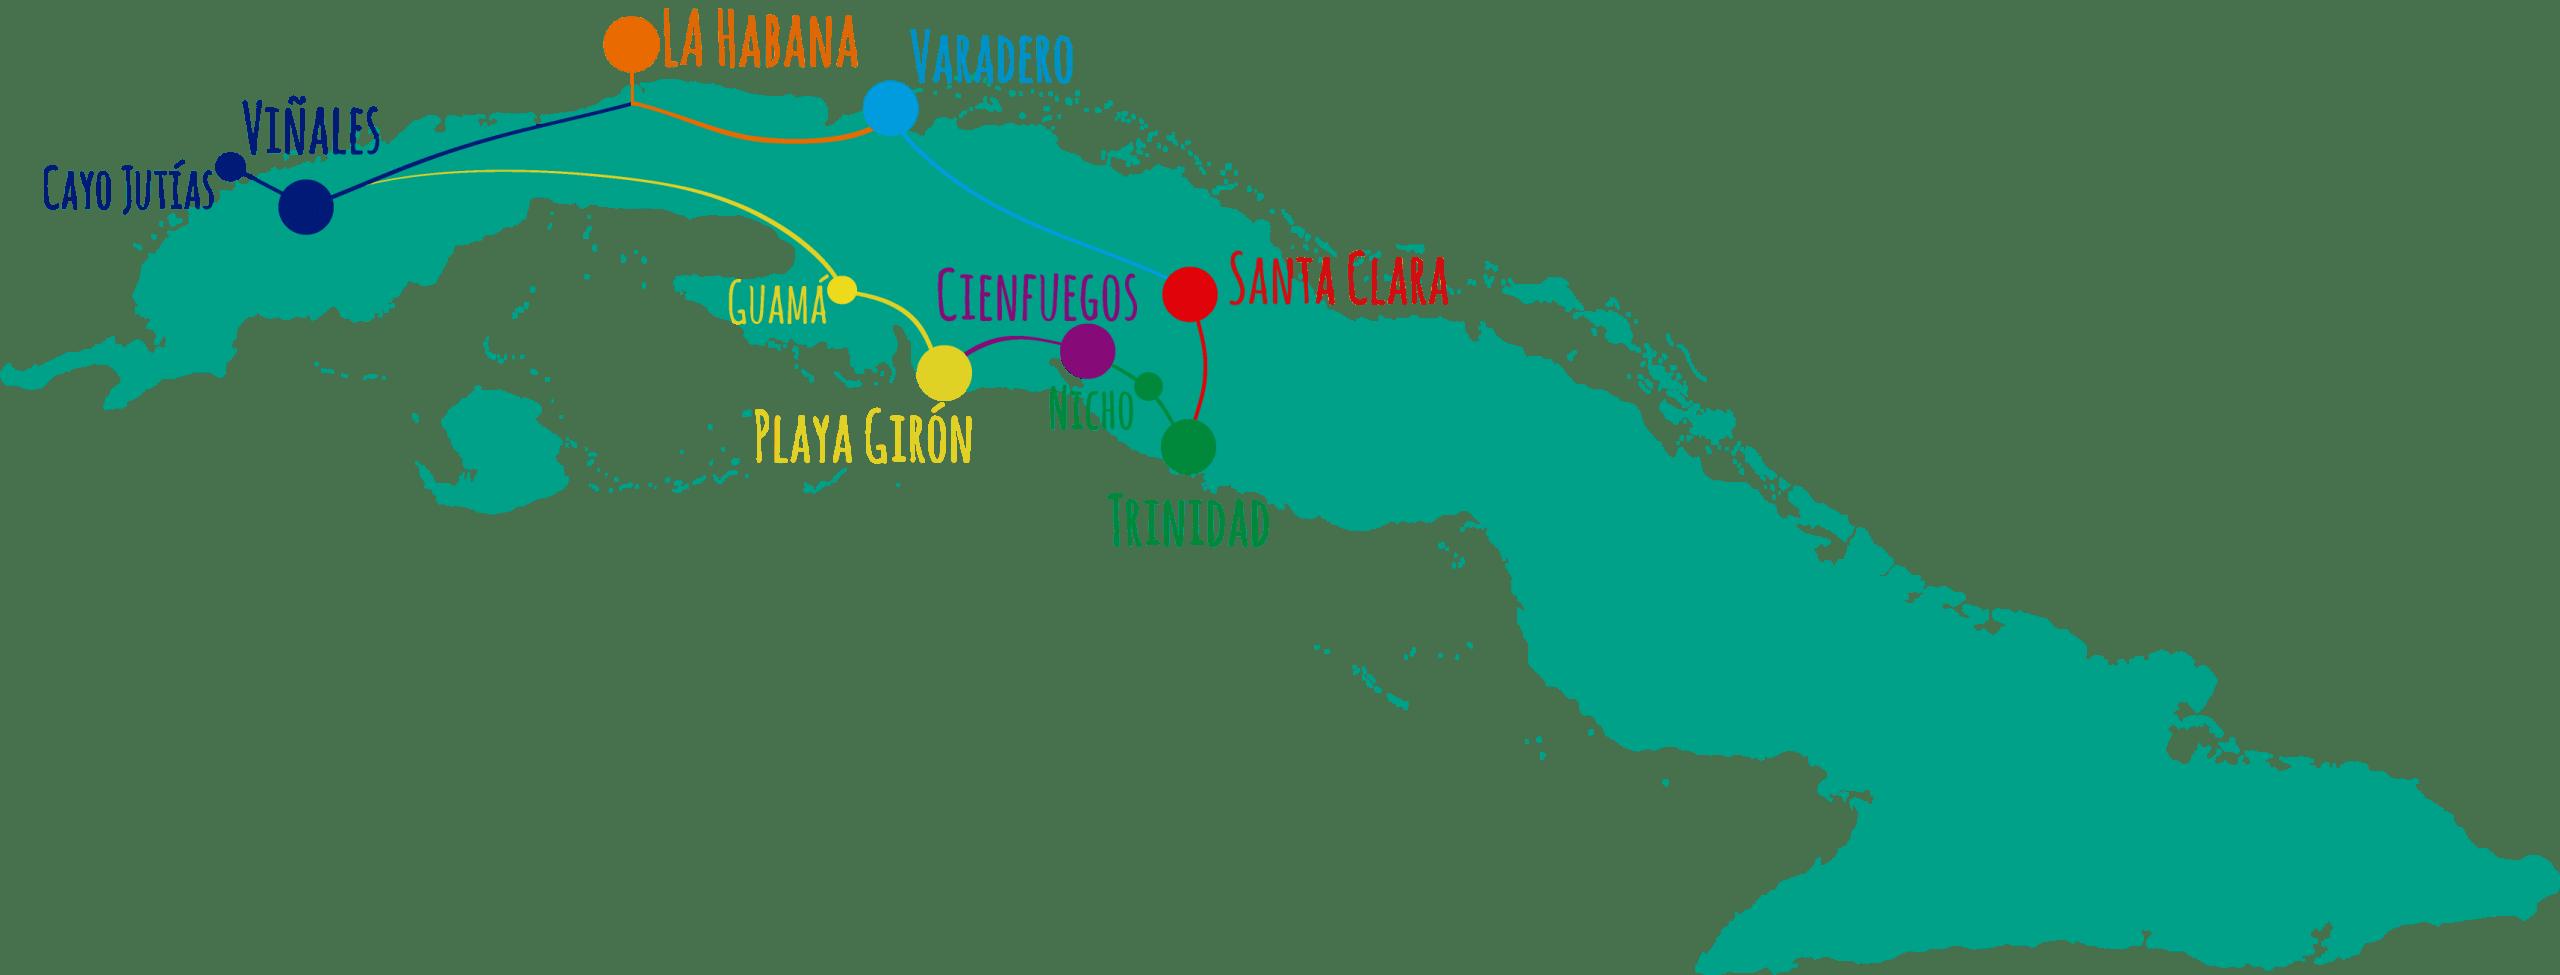 Cuba 2020 • Mapa Cuba scaled